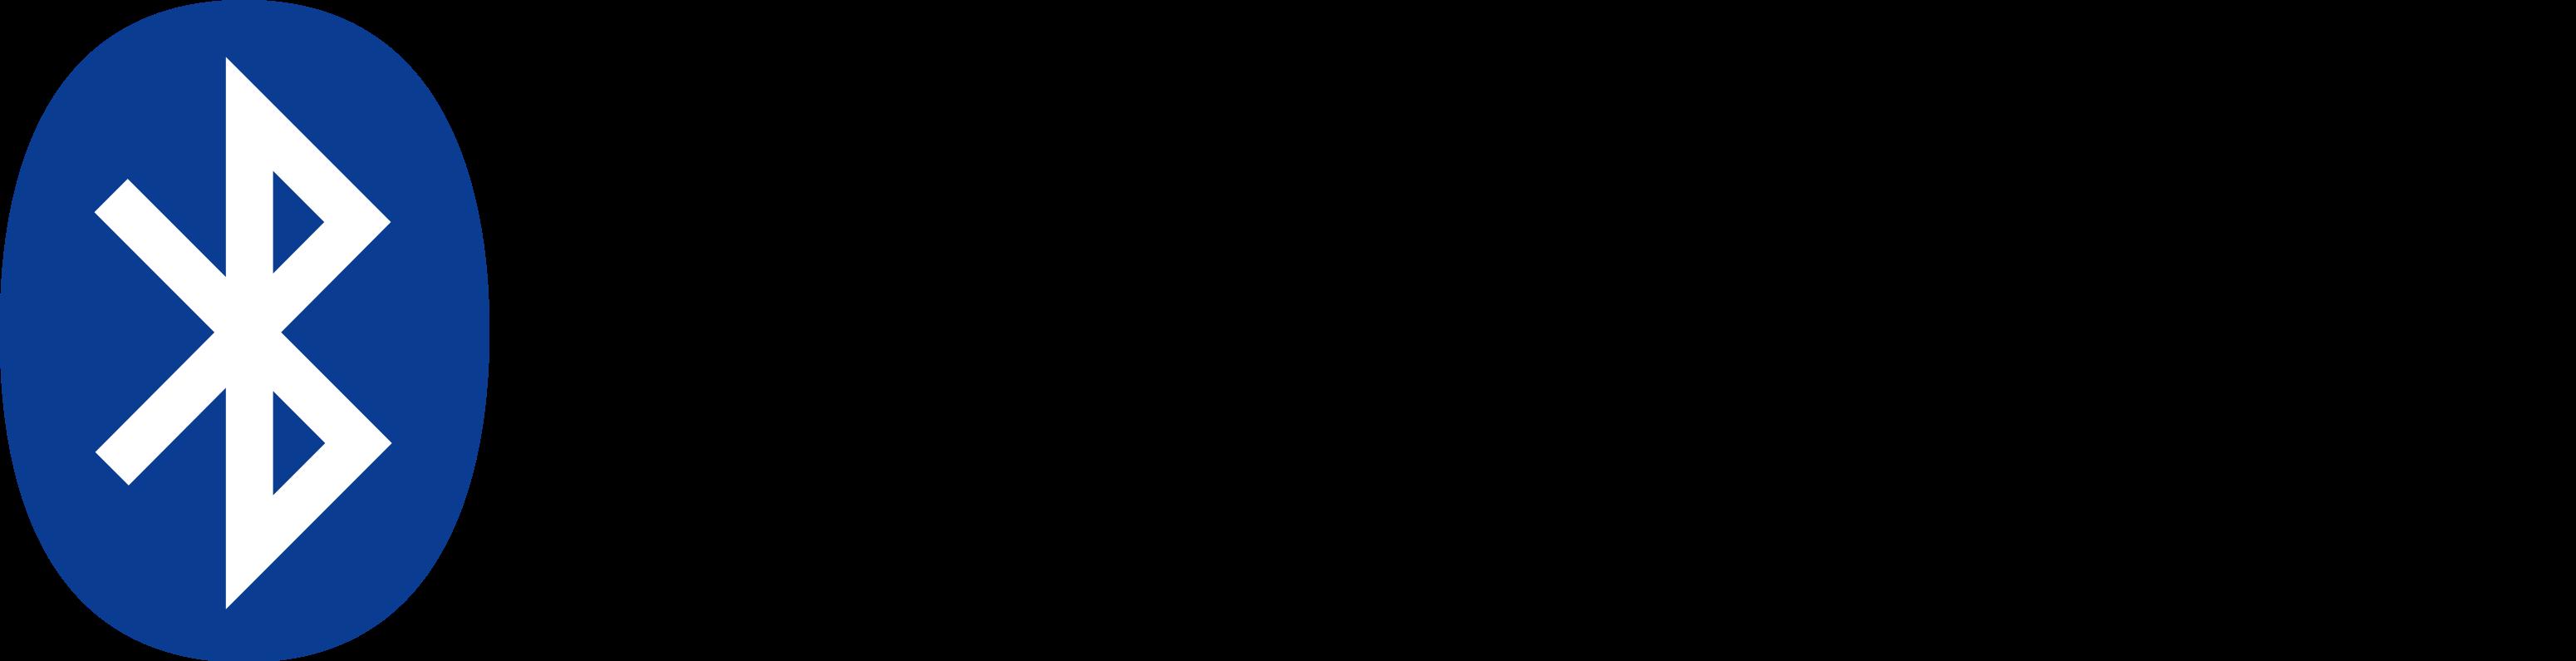 bluetooth logo.